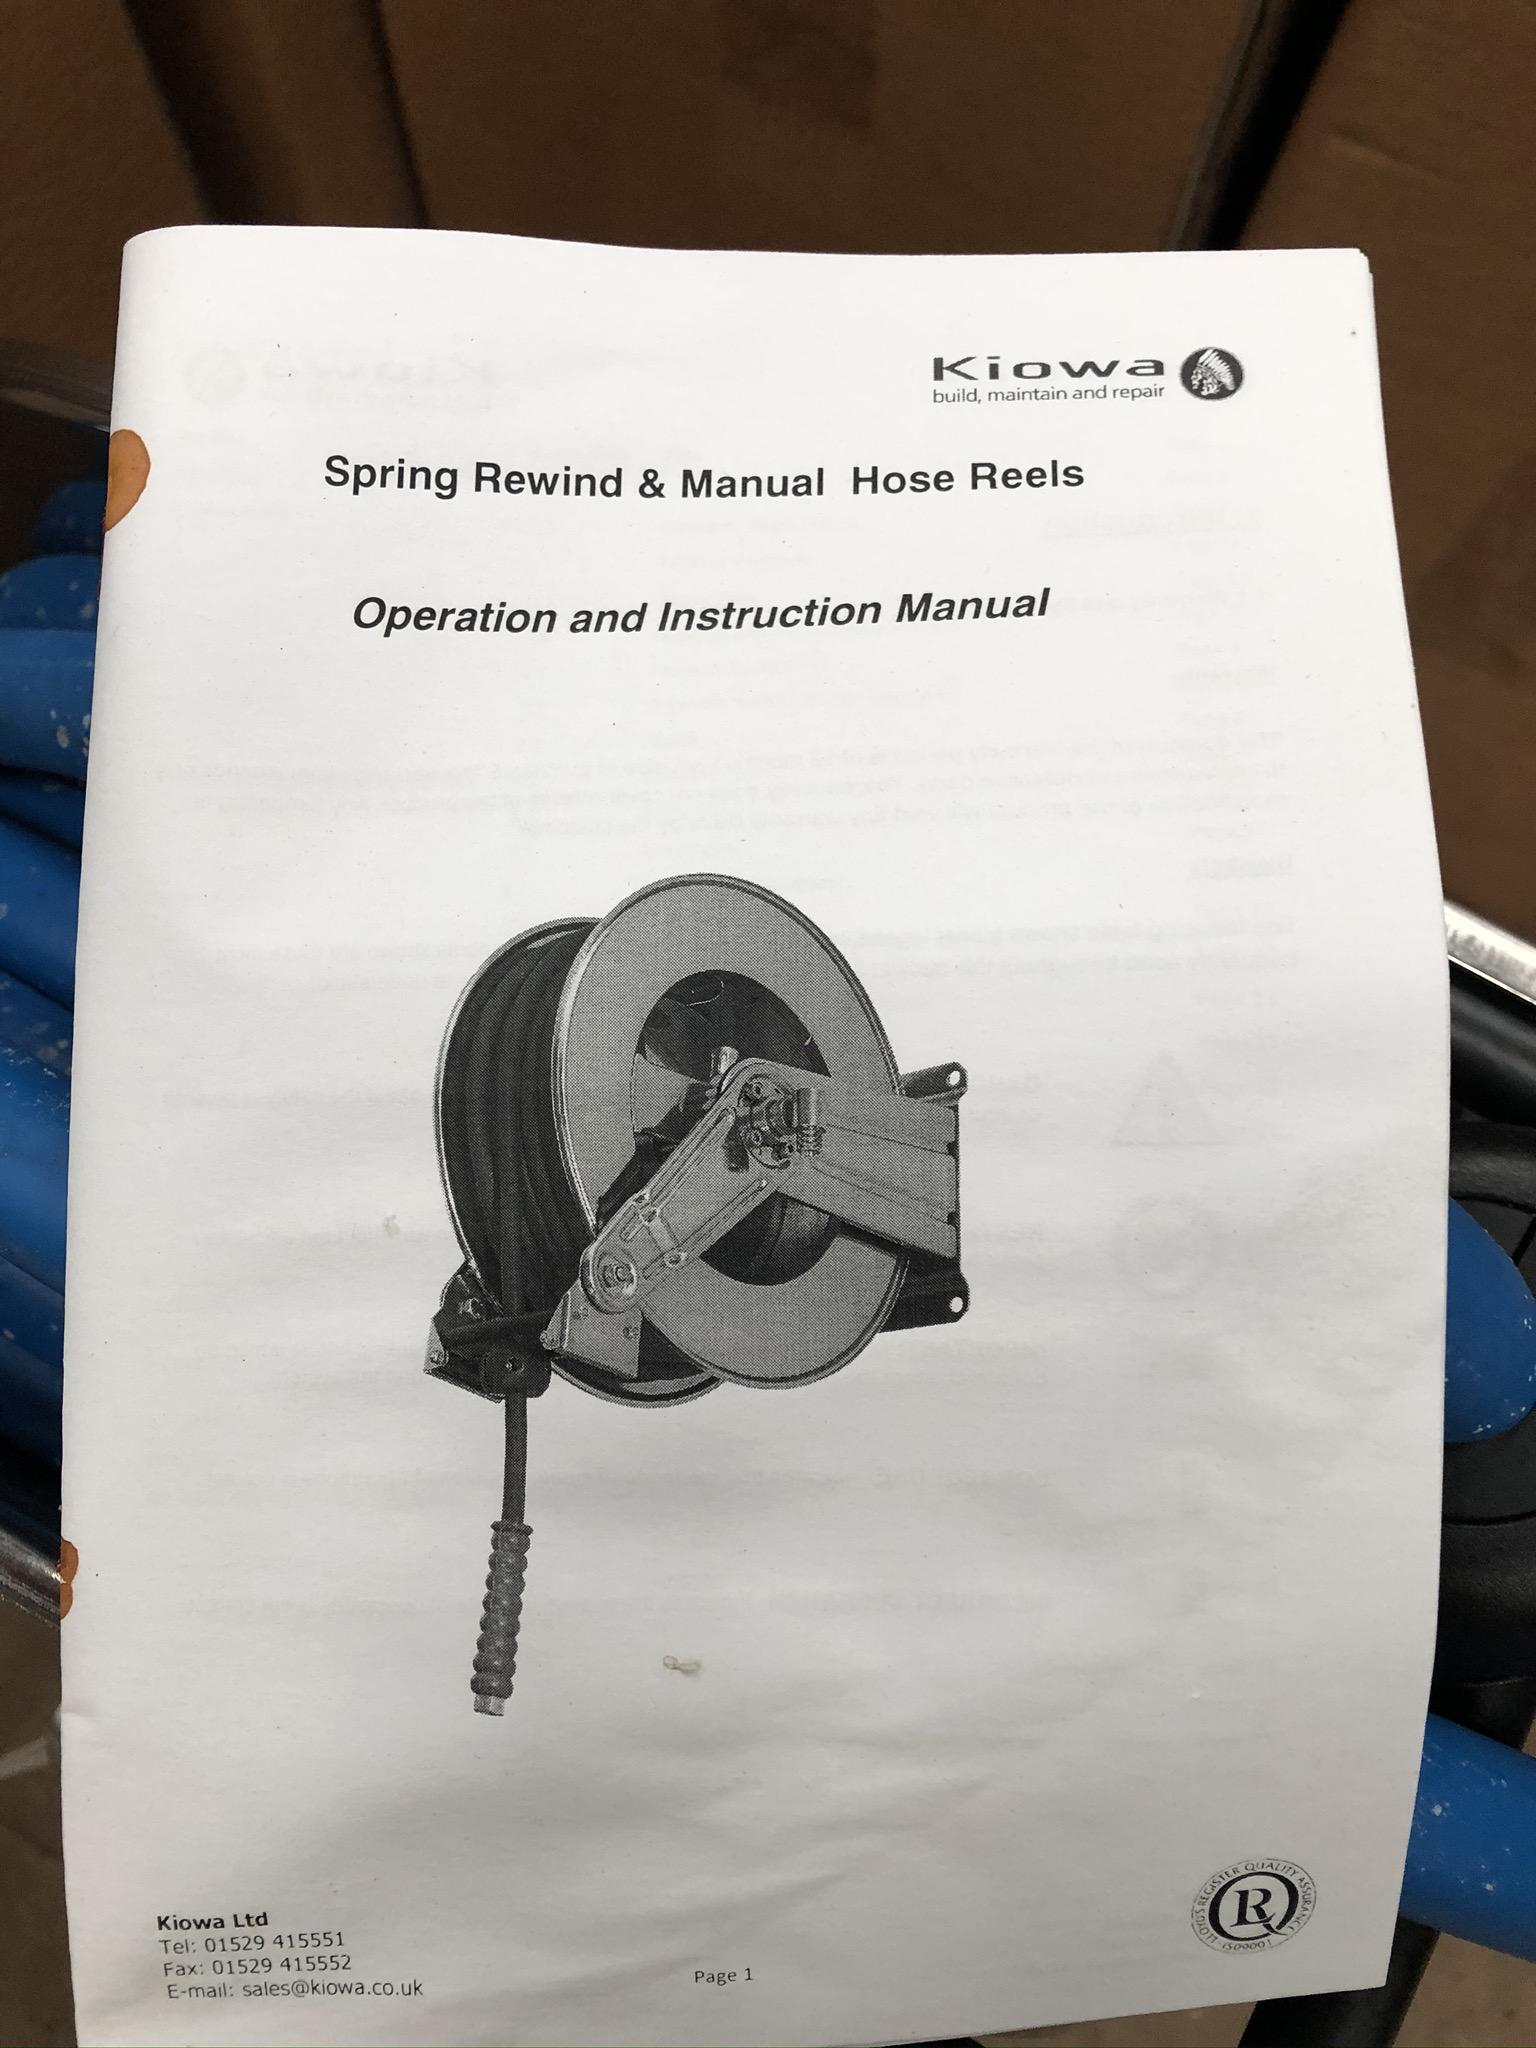 Lot 63 - Kiowa Spring Rewind & Manual Hose Reel, plant no.